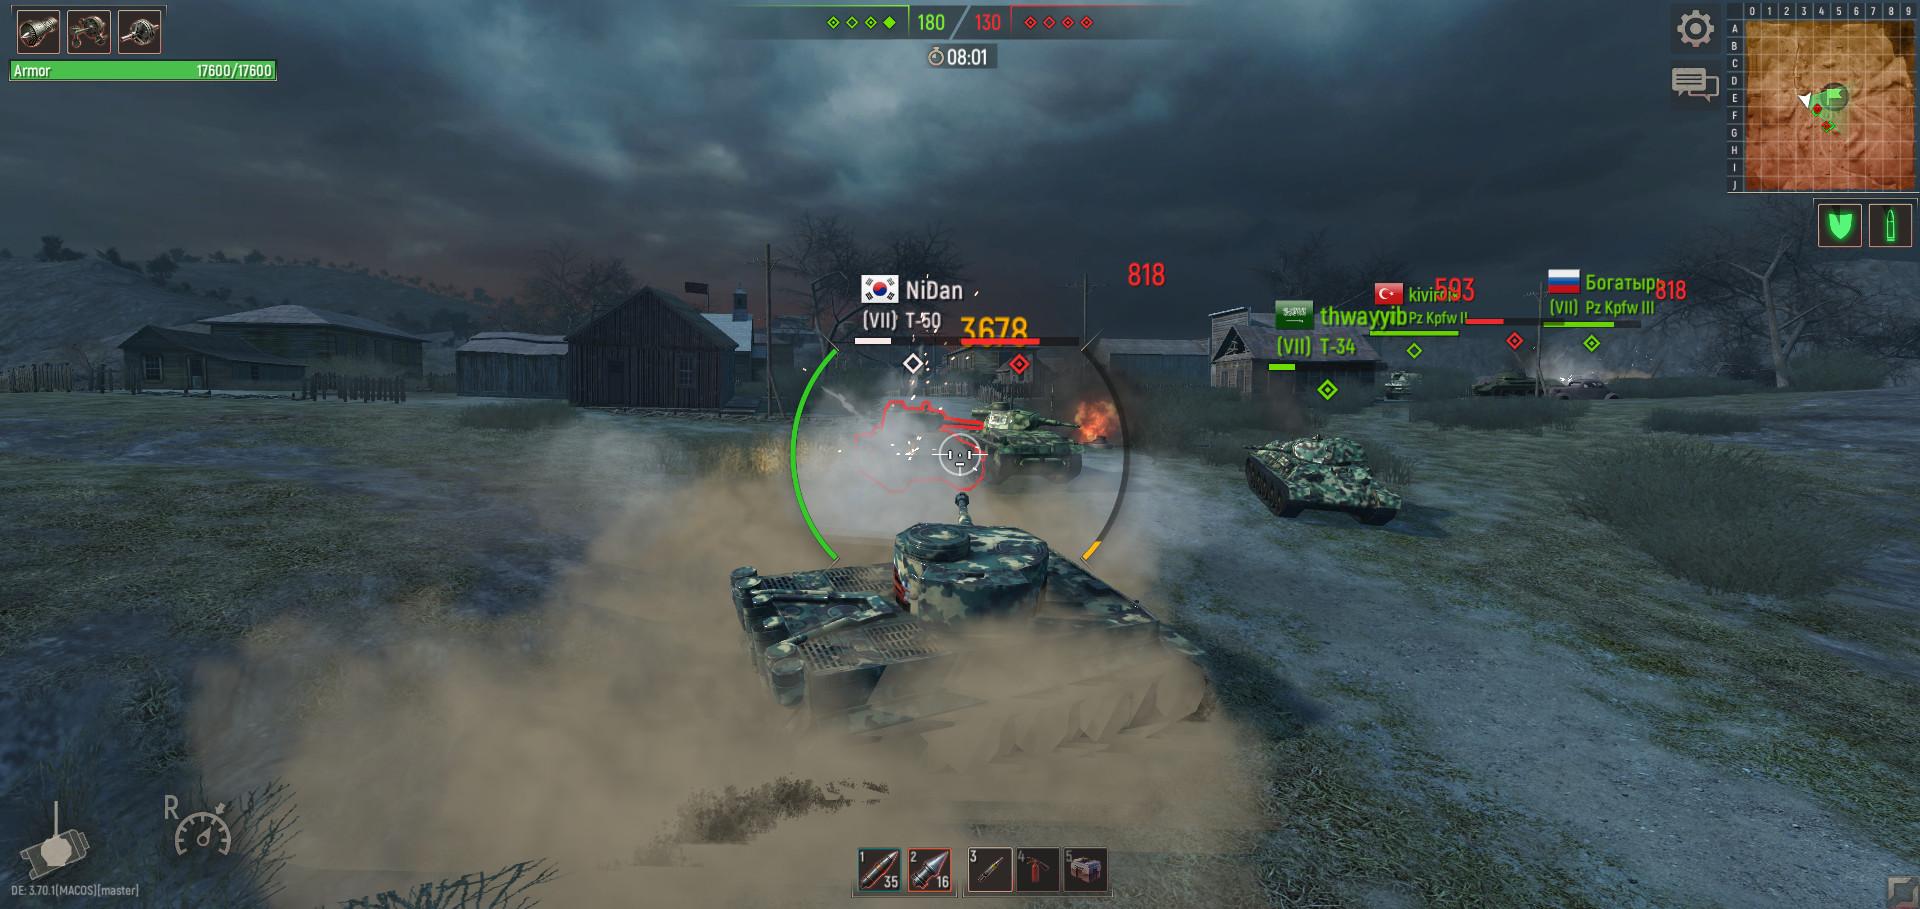 Battle Tanks: Legends of World War II on Steam